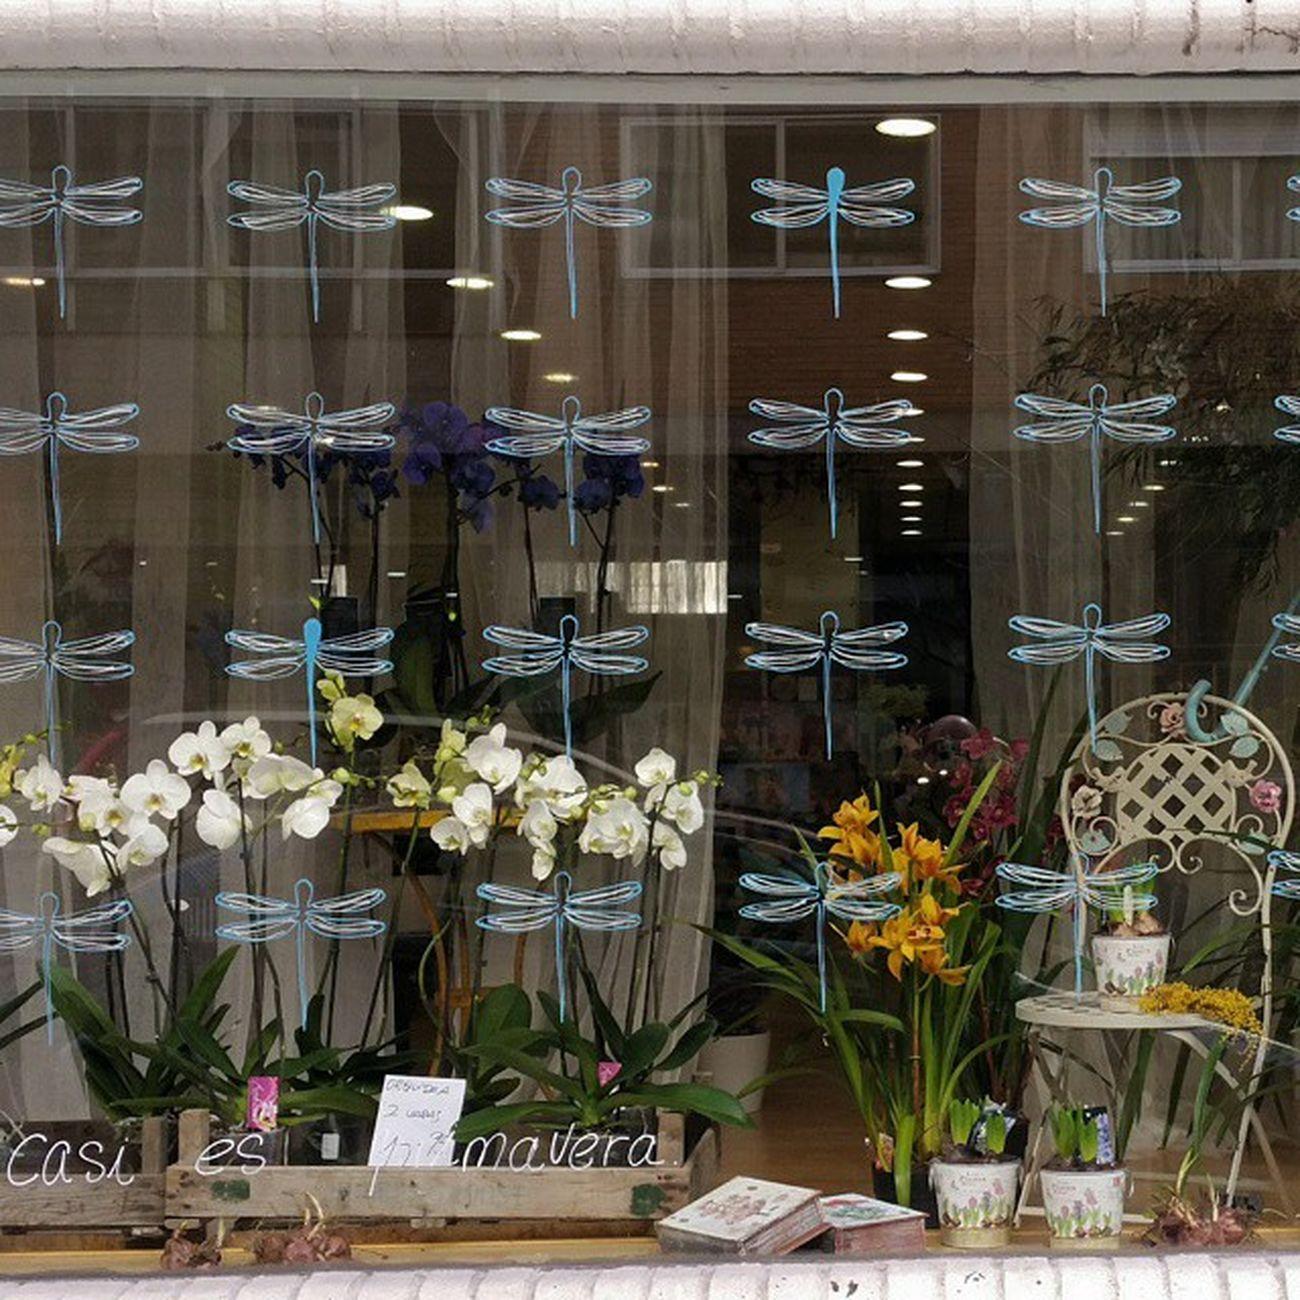 New Window Display at Alea flores   concept store. rúa Barcelona, 83 Vigo Aleafloristerias Inspiration Orquídea Phalaenopsis Yacasiesprimavera Springiscomming